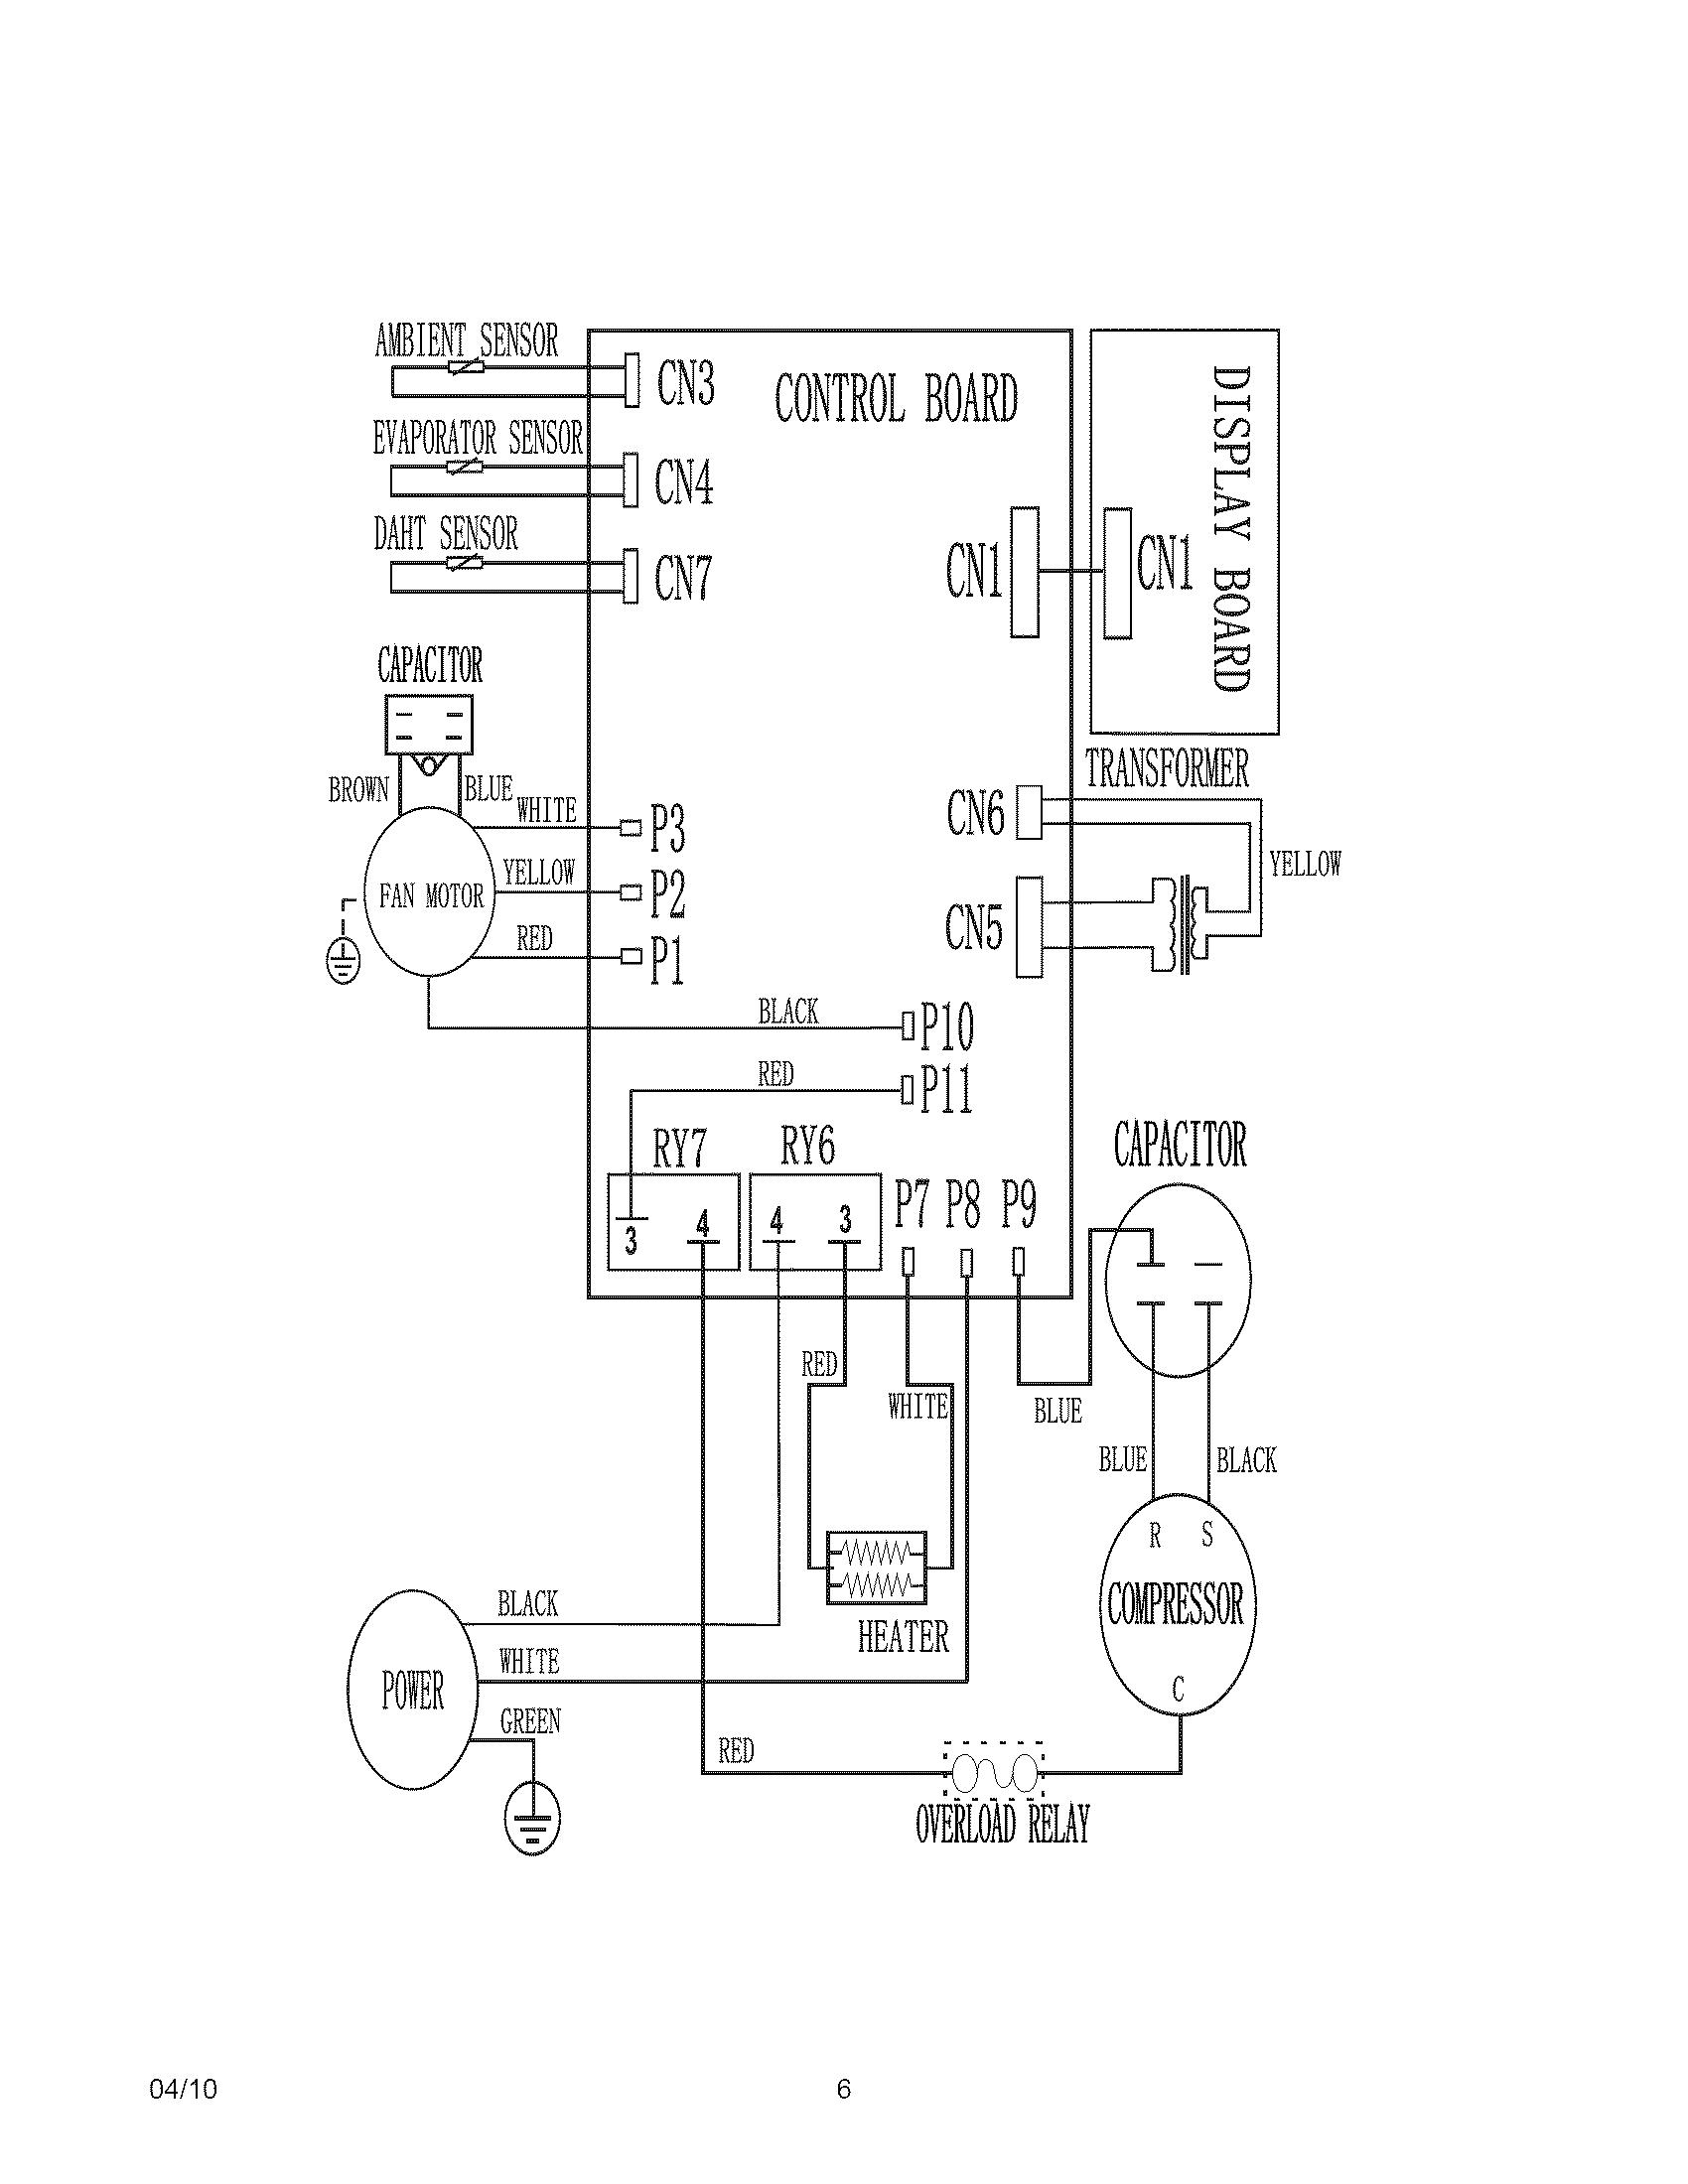 fedders furnace wiring diagram   30 wiring diagram images